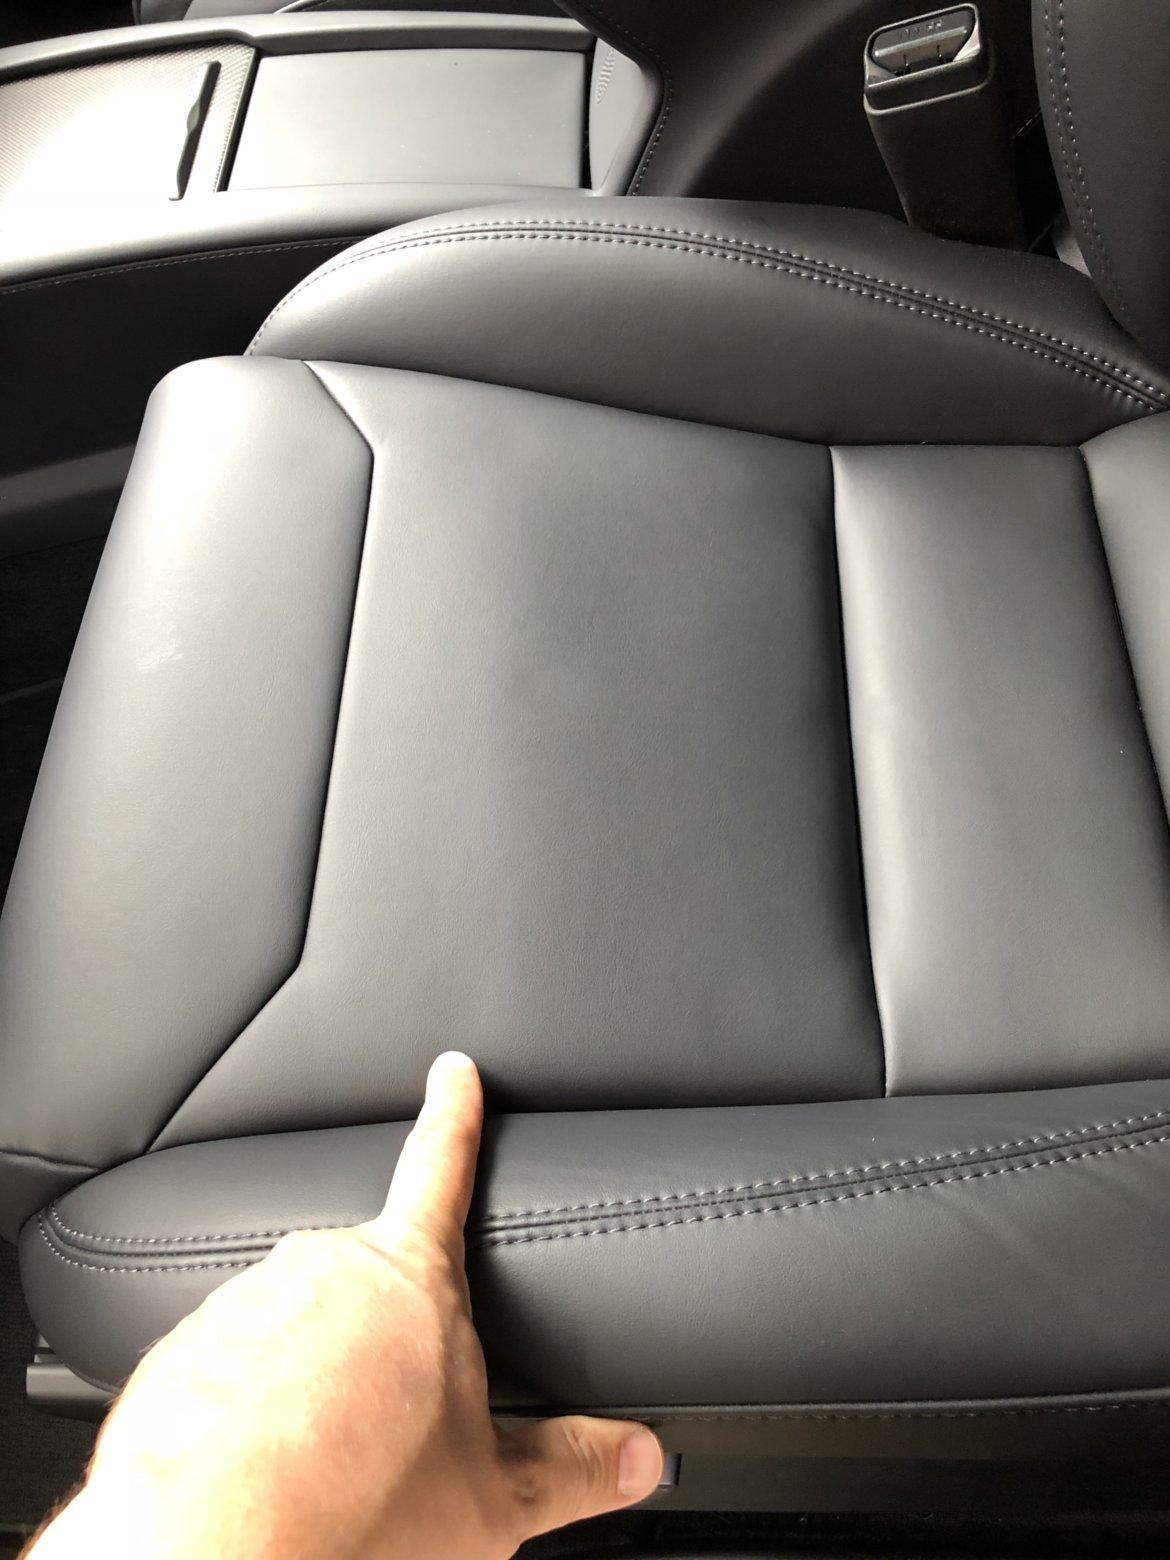 test_seat.jpeg